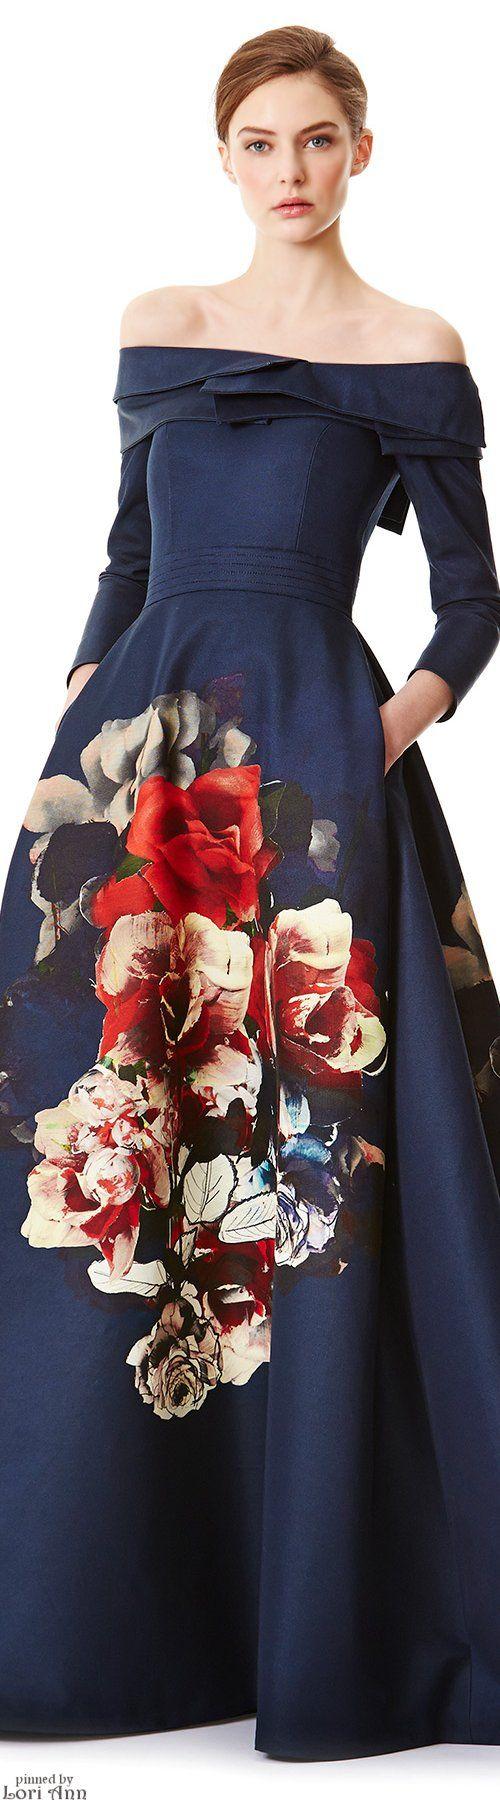 Carolina Herrera Pre-Fall 2015 #fashion #style #instyle #fashionista #carolinaherrera #carolina #herrera